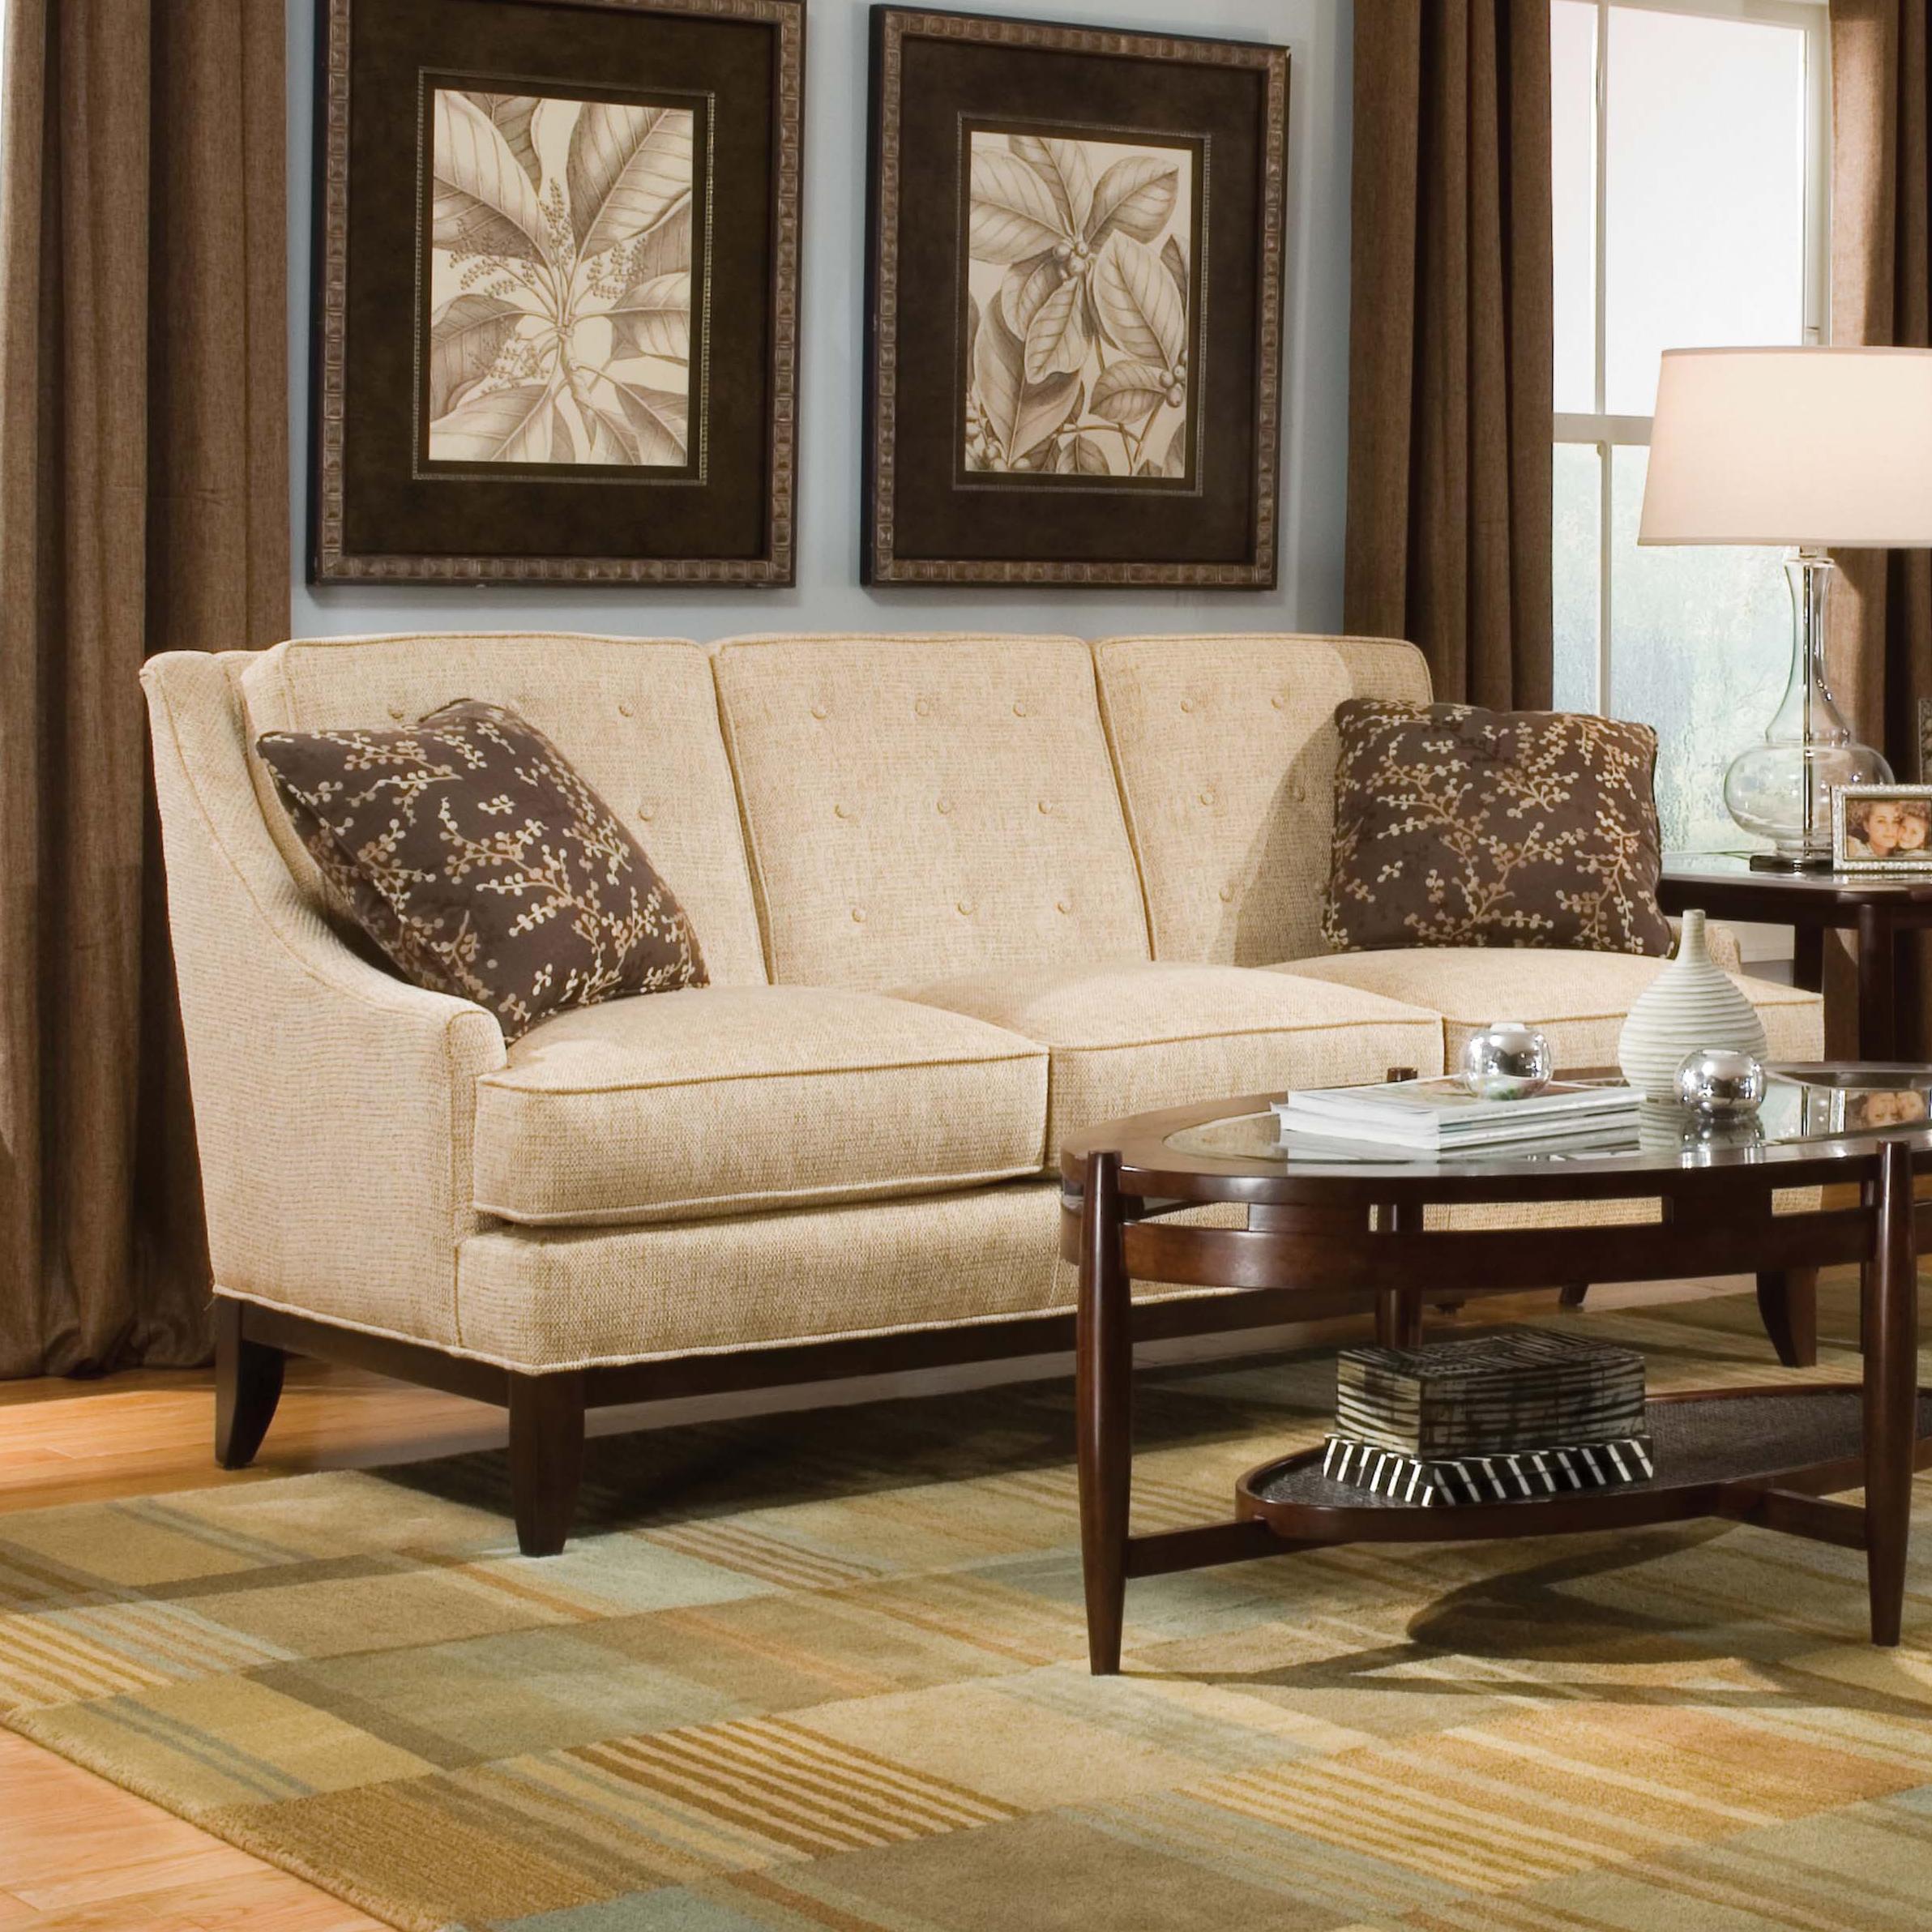 Beau Olindeu0027s Furniture